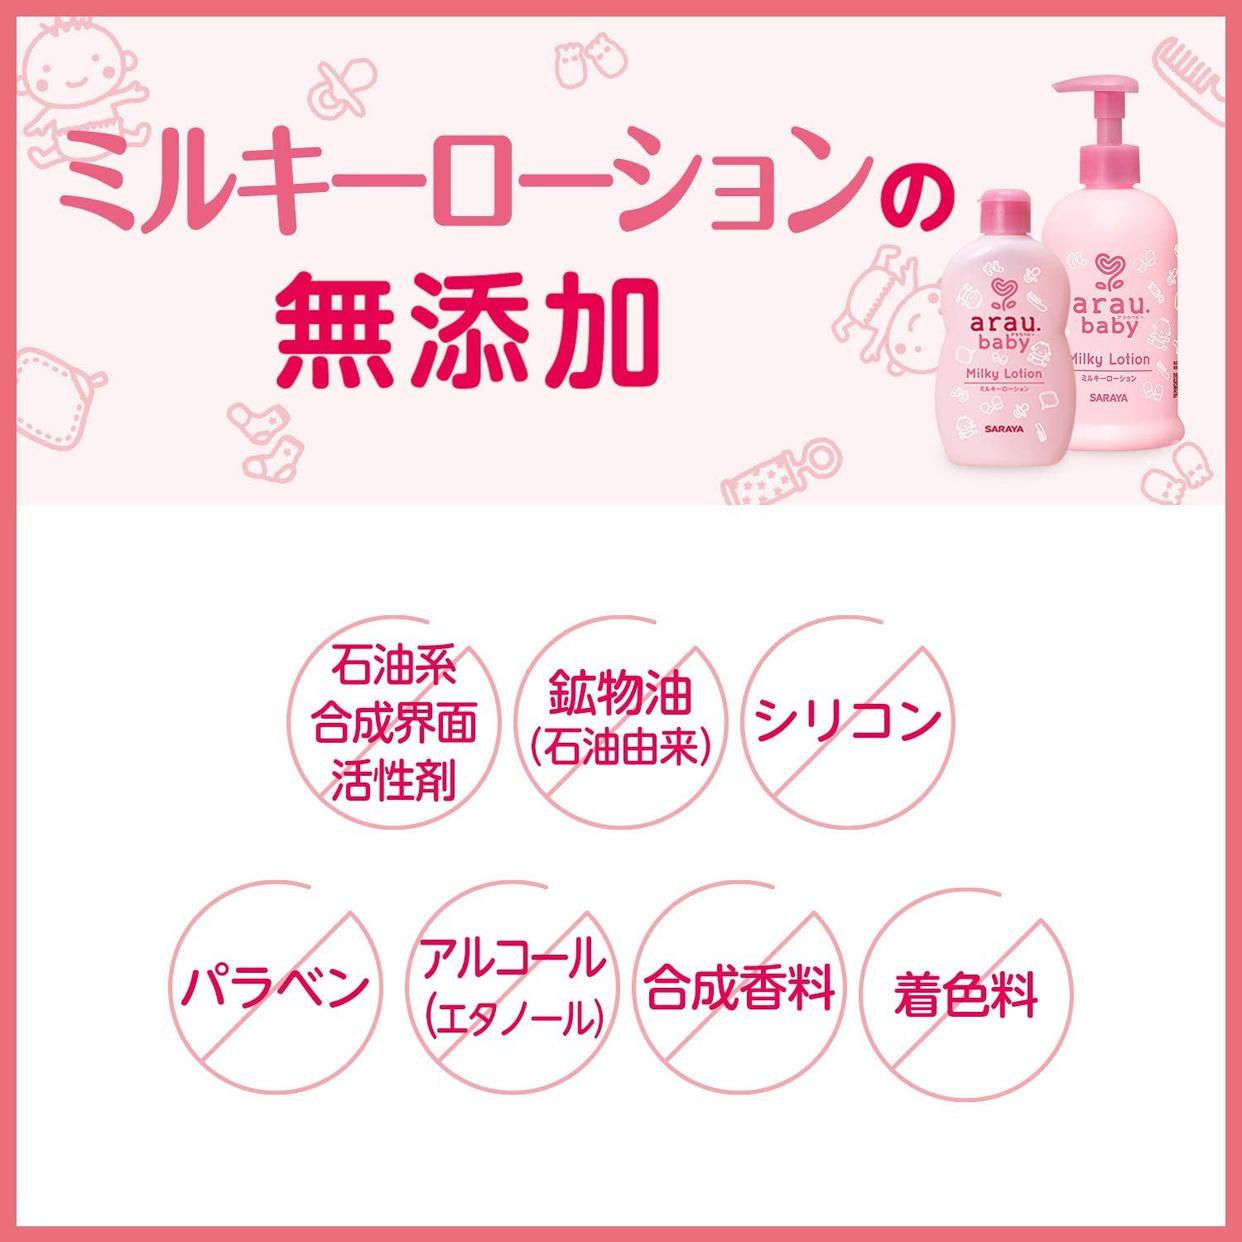 arau.baby(アラウ.ベビー) ミルキーローションの商品画像4